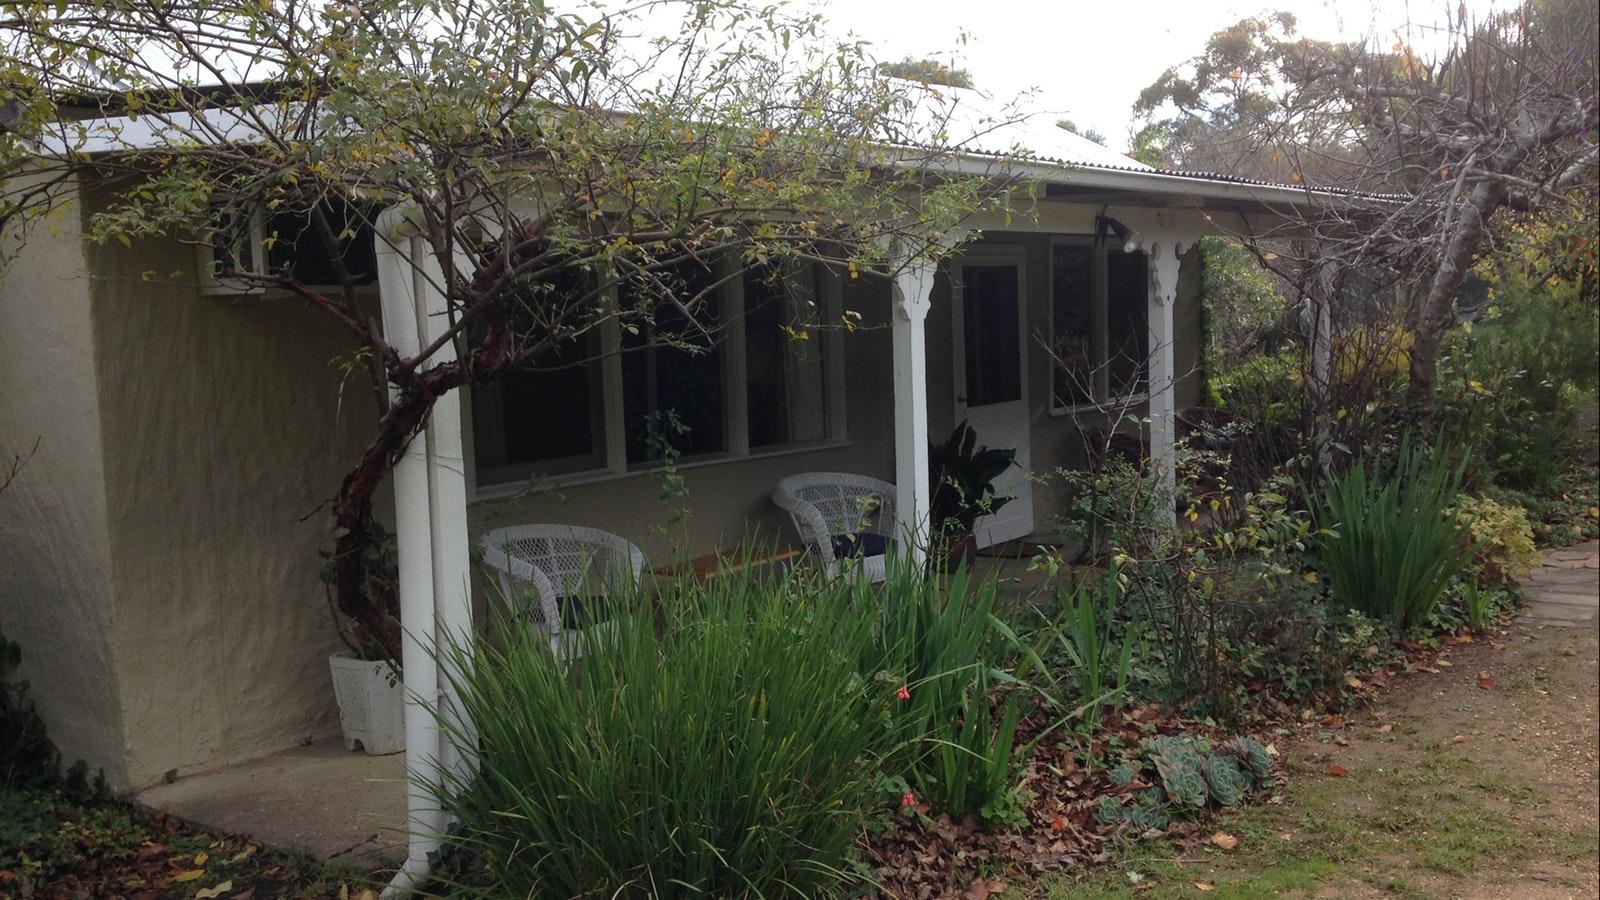 Shady verandah on the cosy cottage accommodation